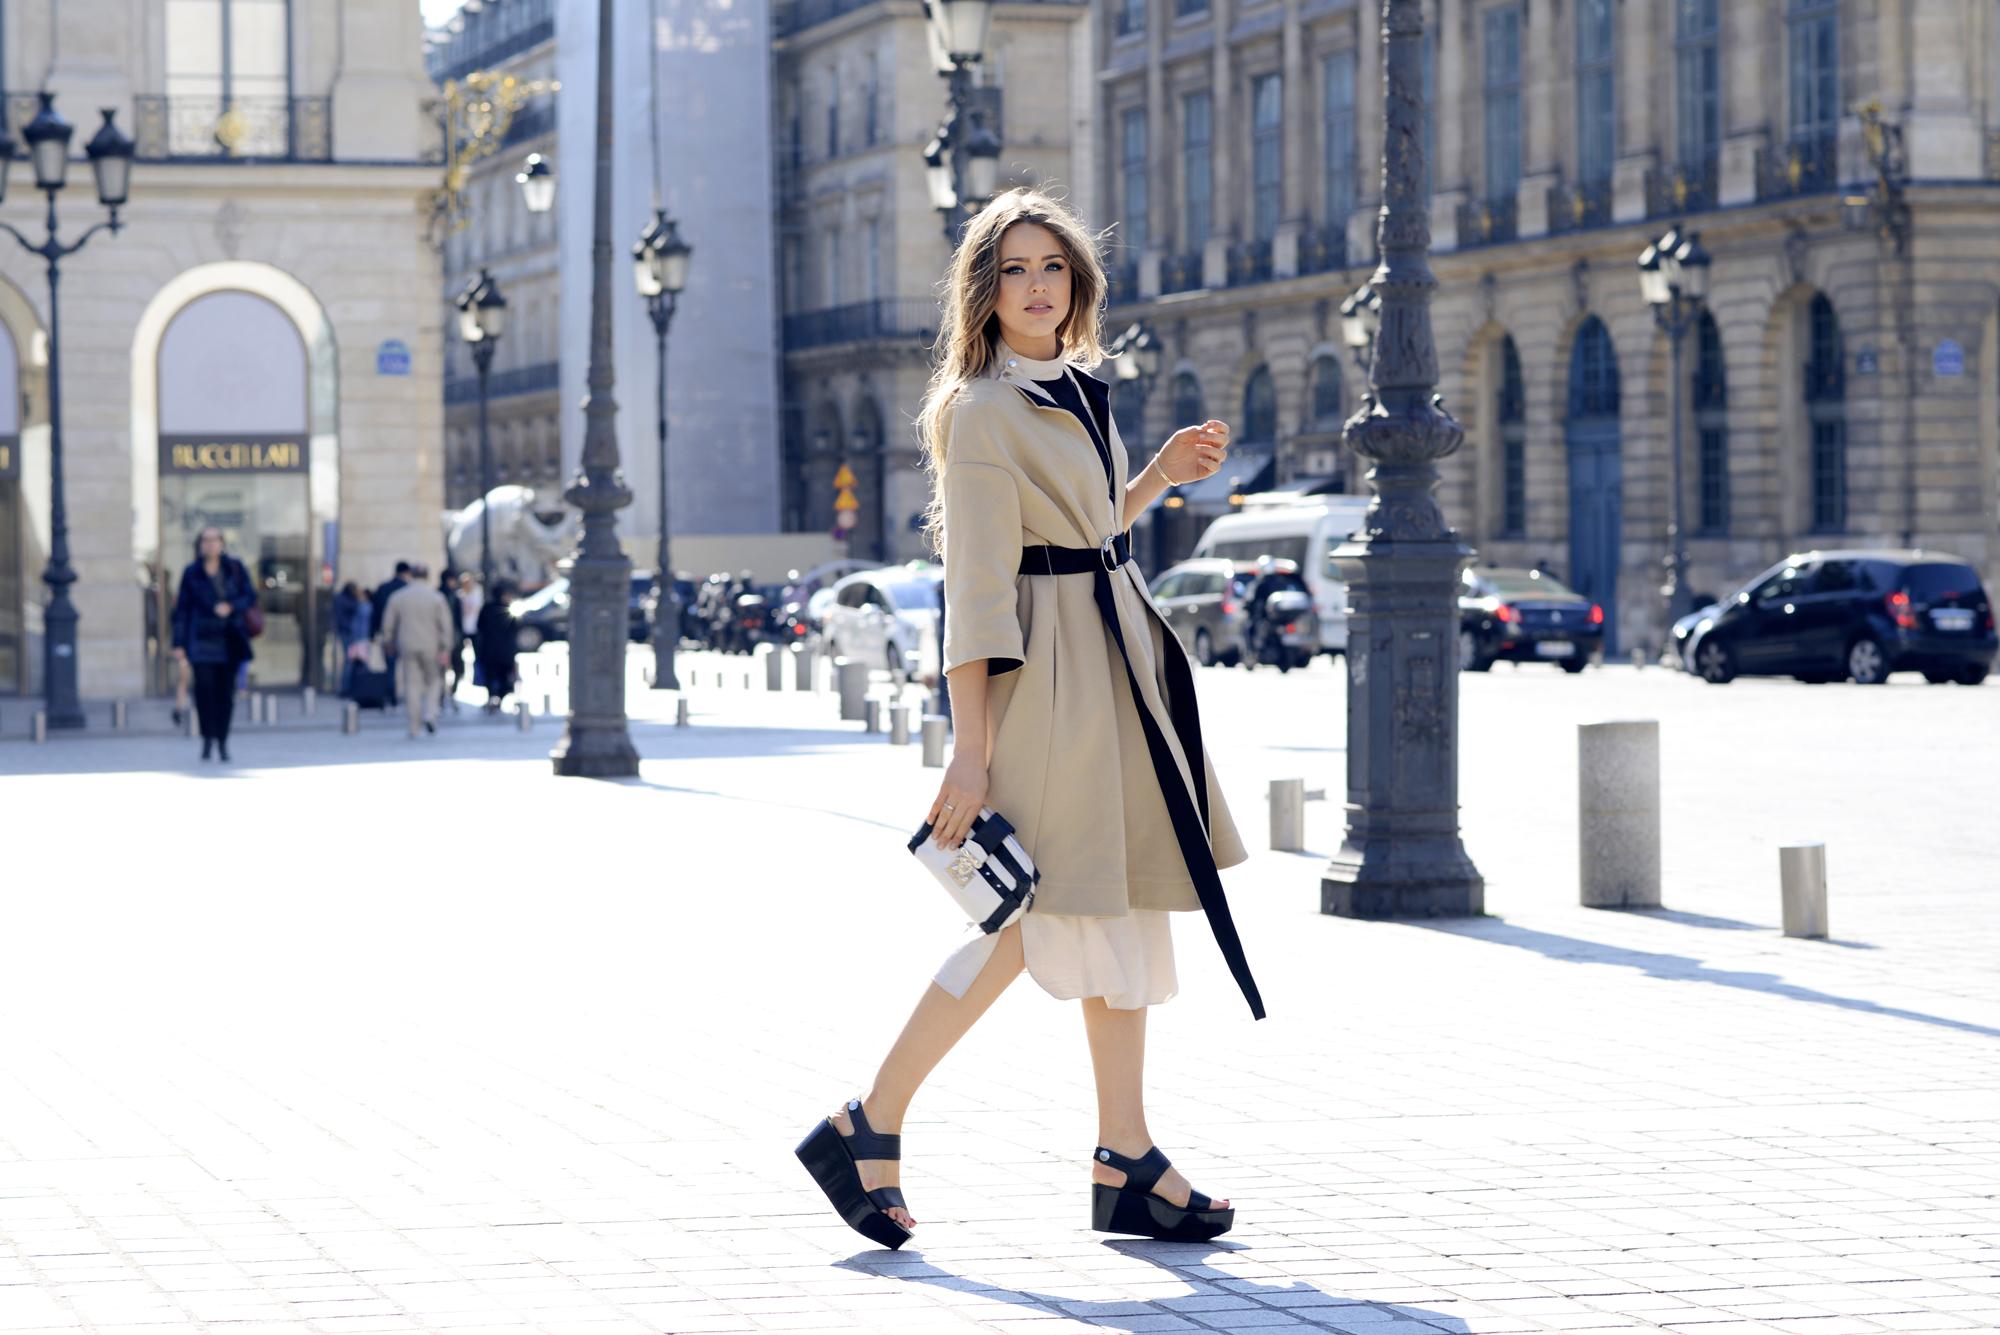 Cibelle x Kristina | L'OrealStreet_14